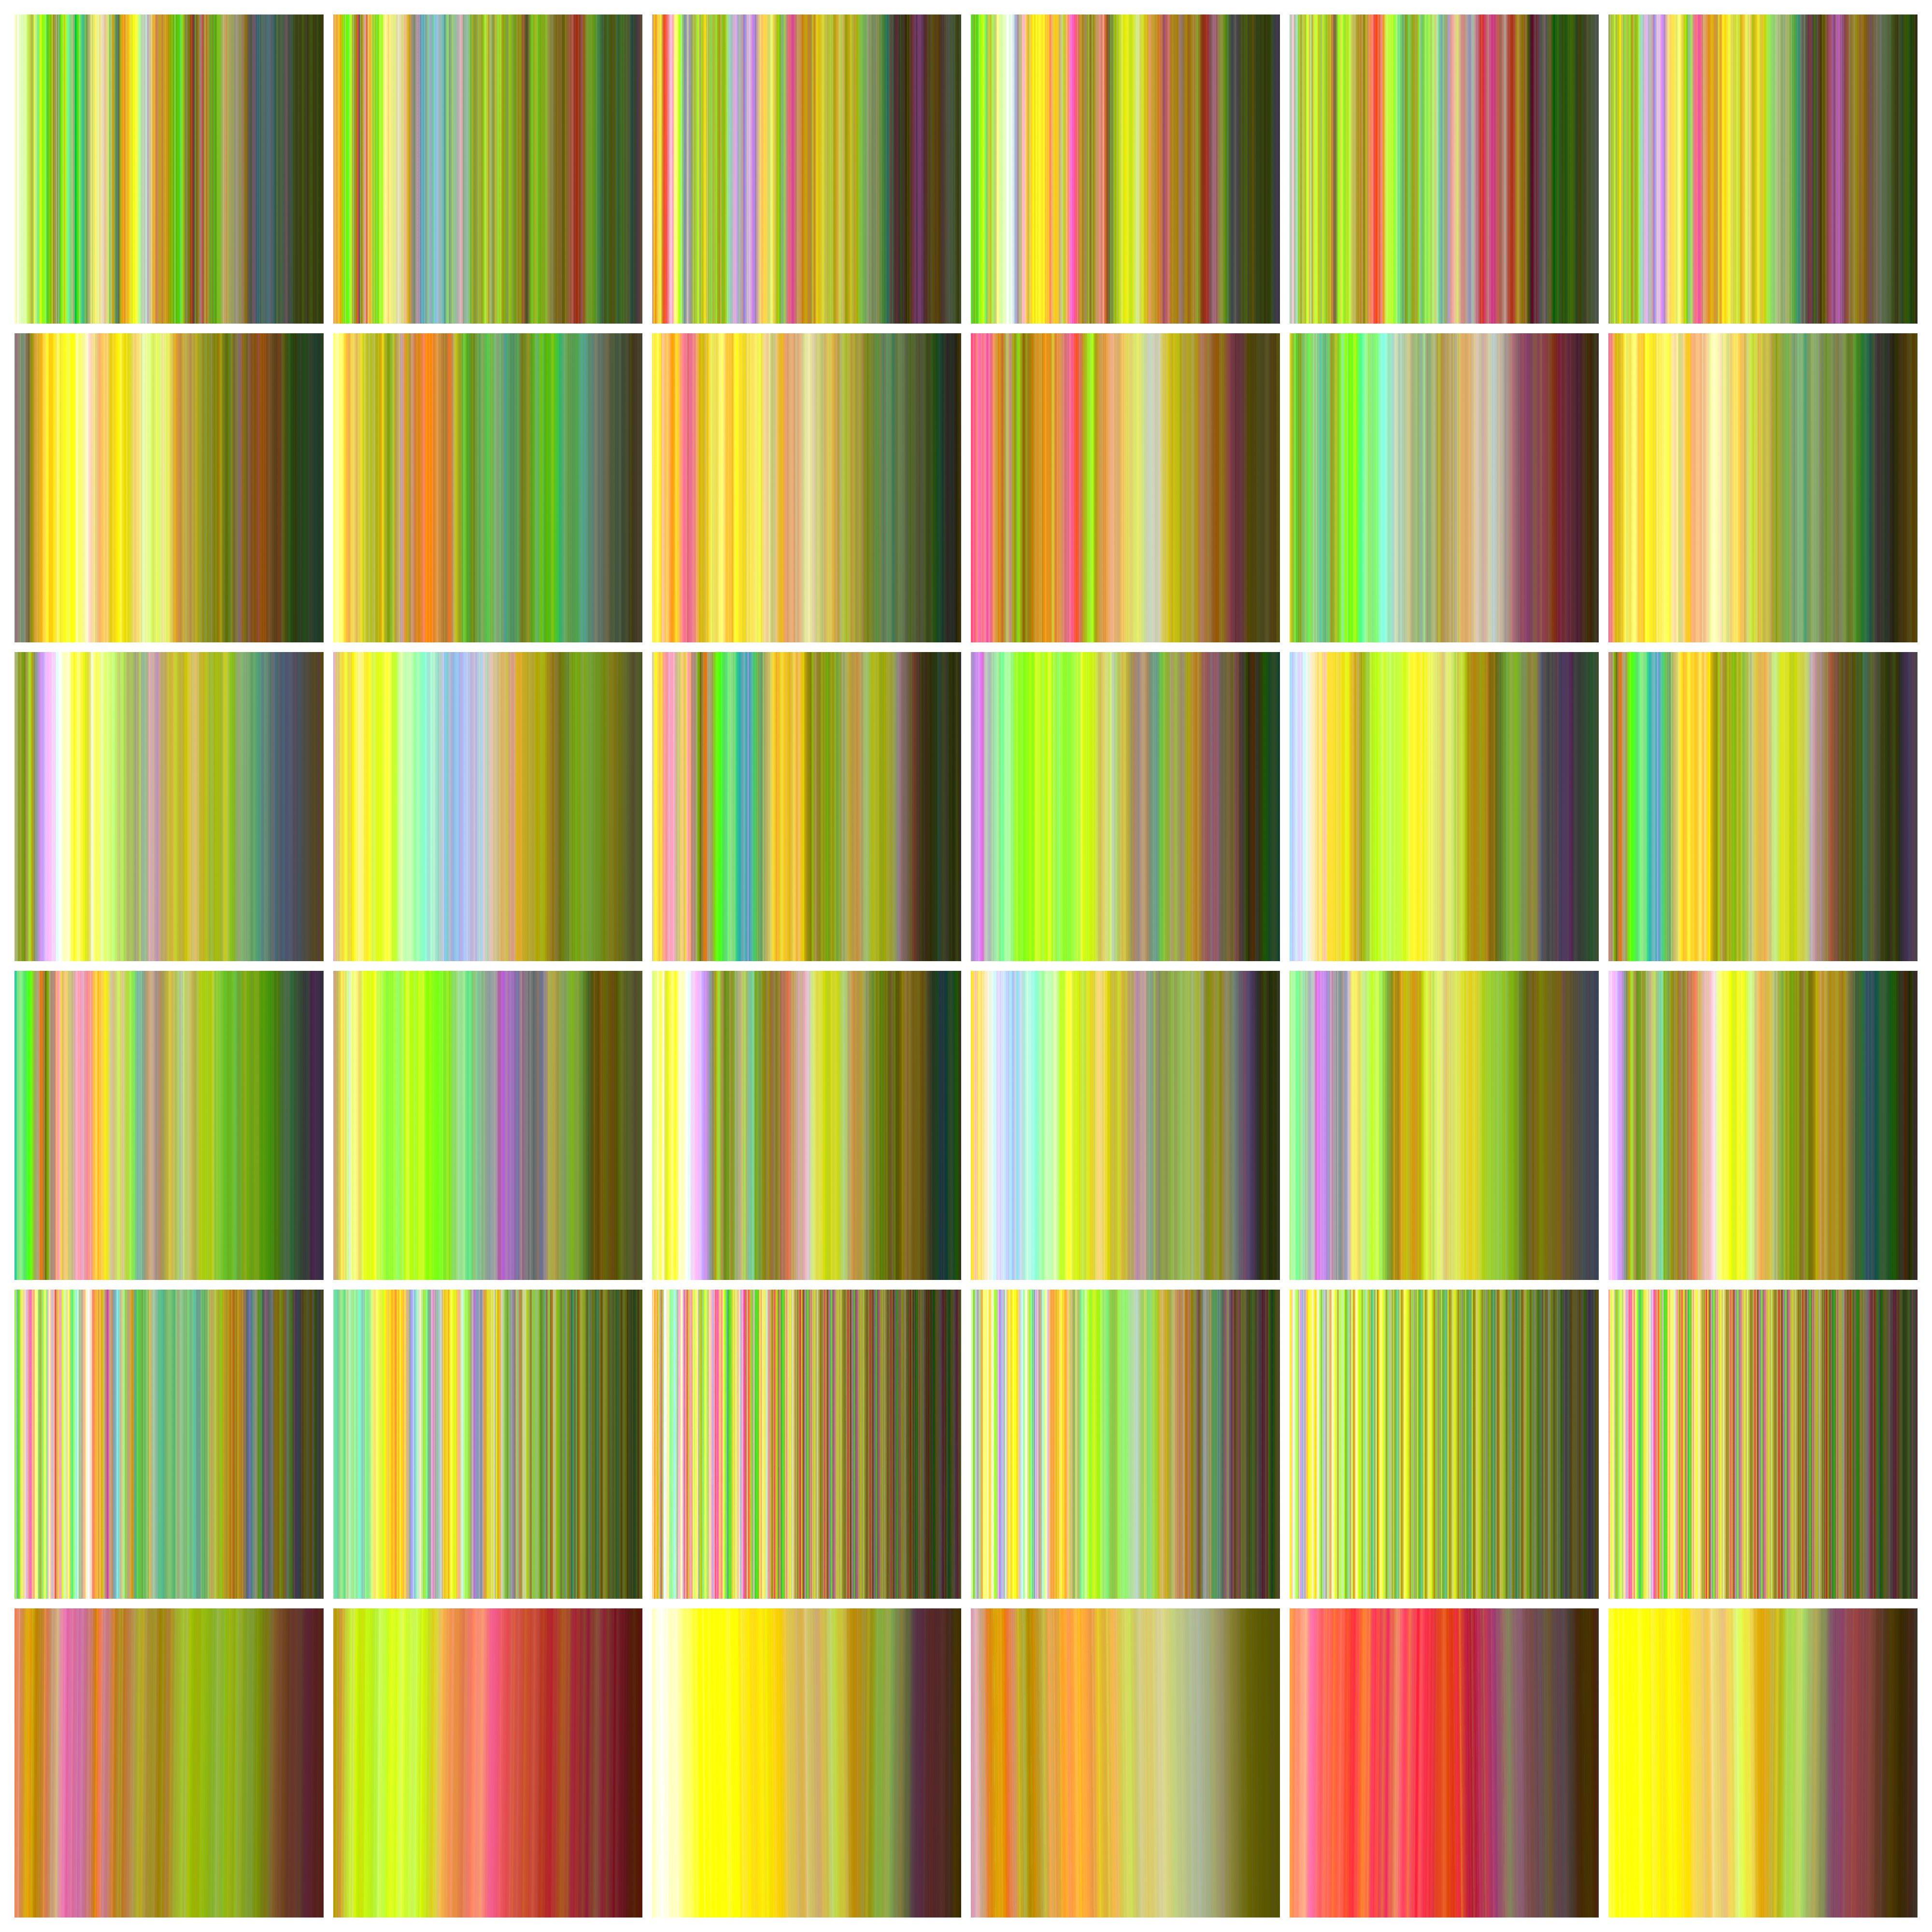 Plasma Gradient Gradation PSD1 by taketo-take-to-stock